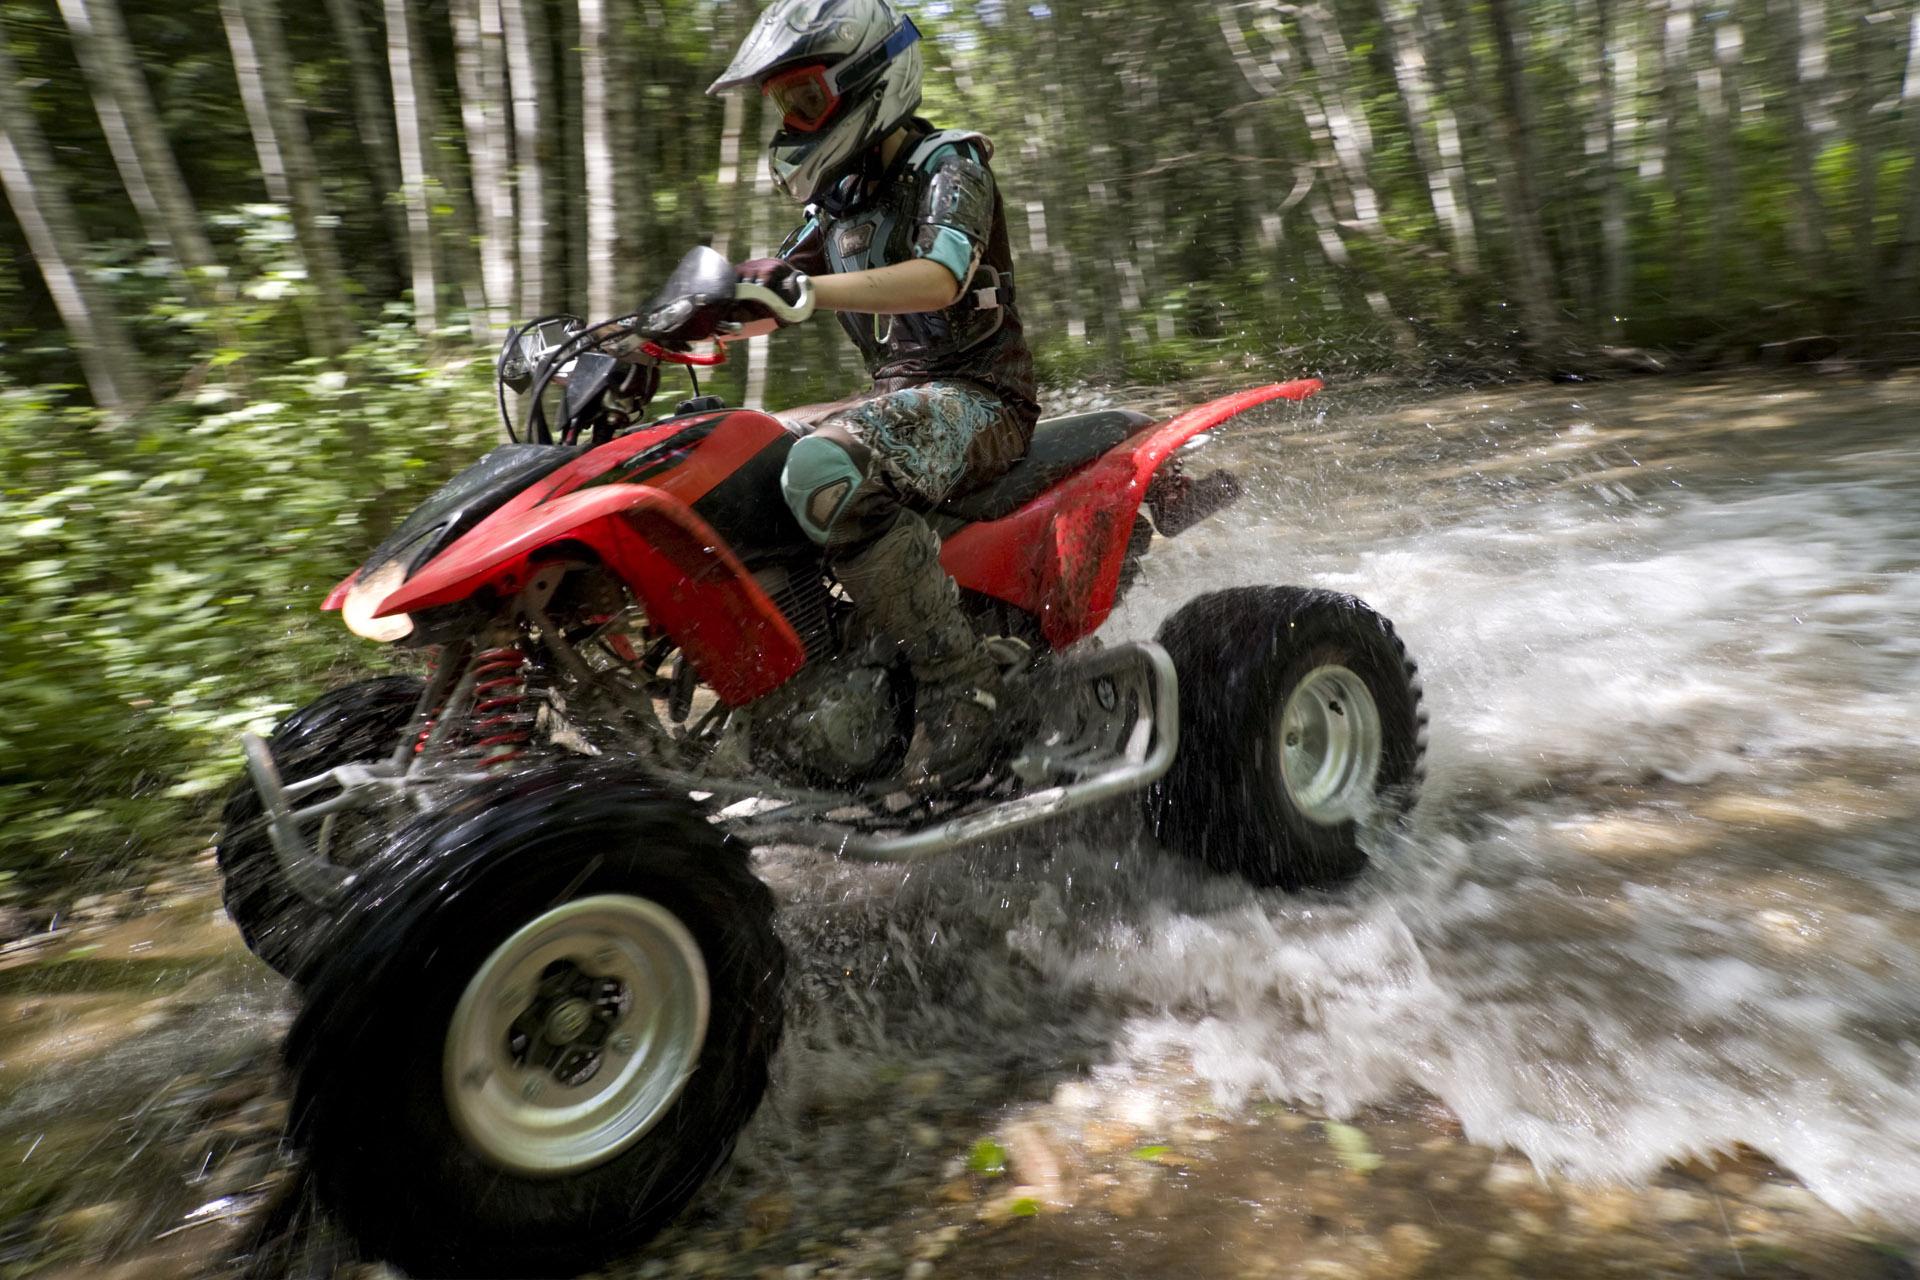 a man riding an ATV crossing the stream